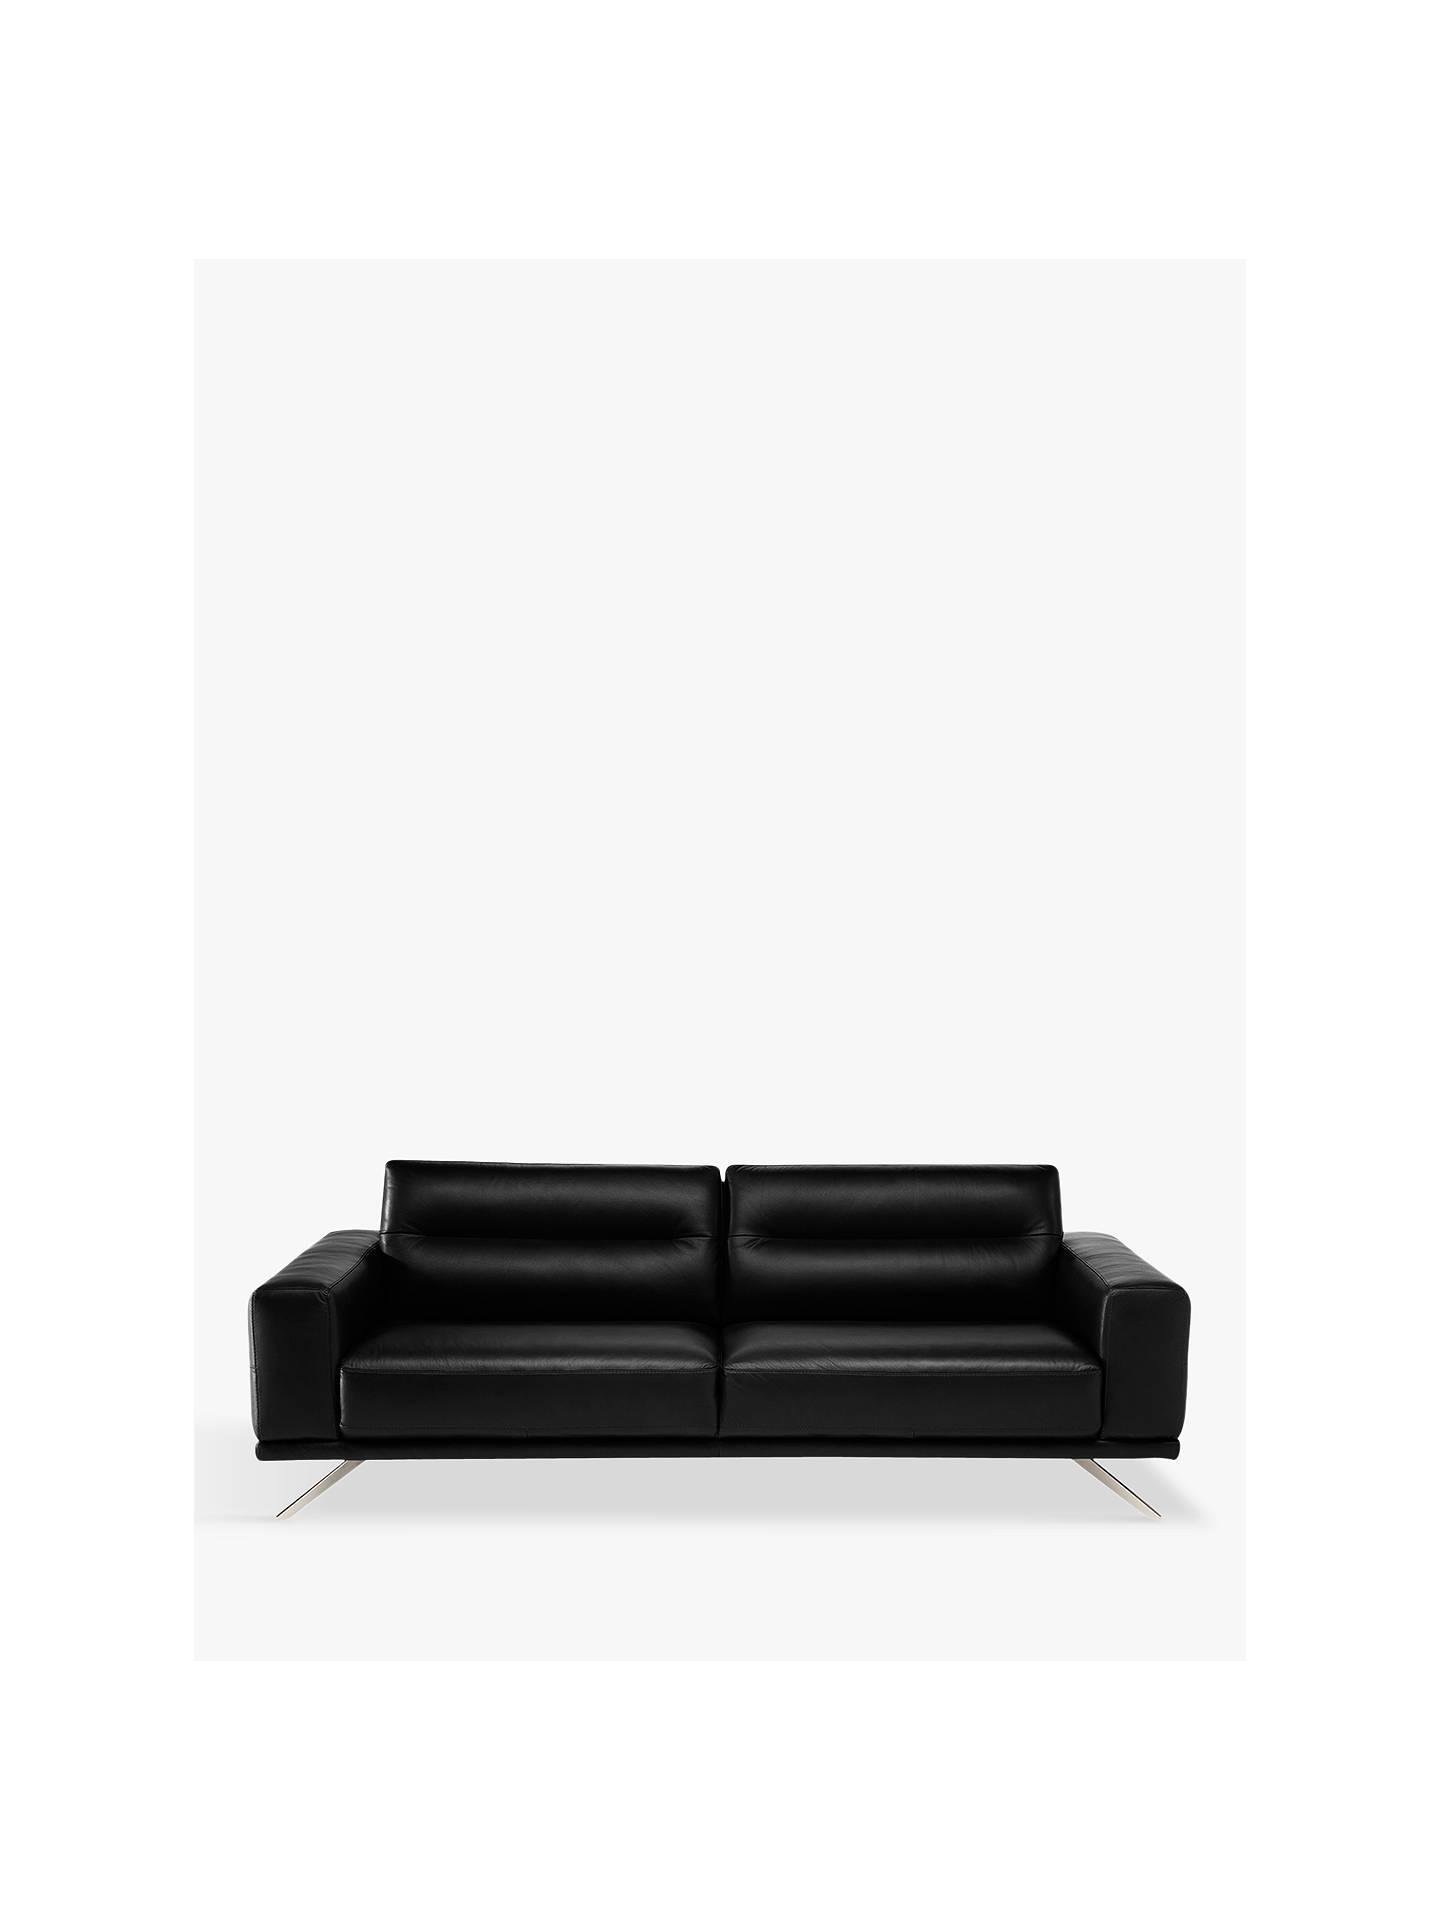 86e571d1ae68 Buy Natuzzi Timido 009 Large 3 Seater Leather Sofa, Nickel Leg, Dream Black  Online ...